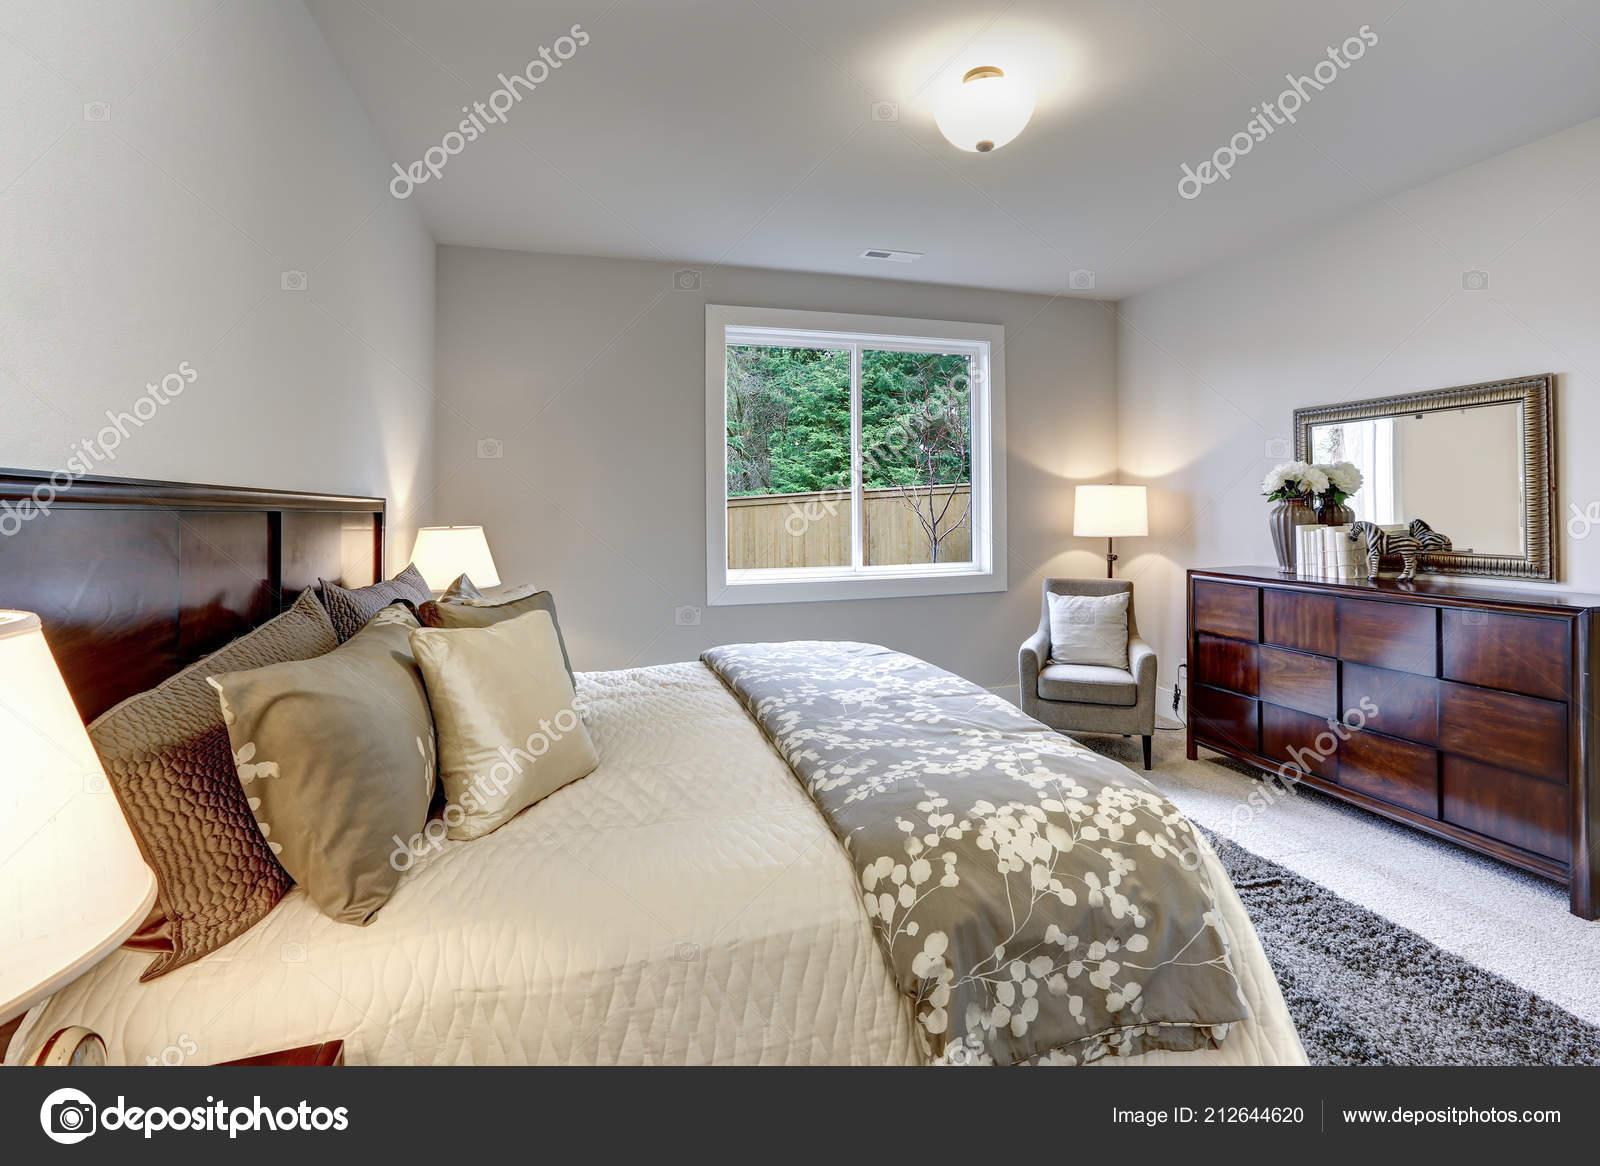 Light Modern Master Bedroom Interior Darkwood Bed Dress Stock Photo C Iriana88w 212644620